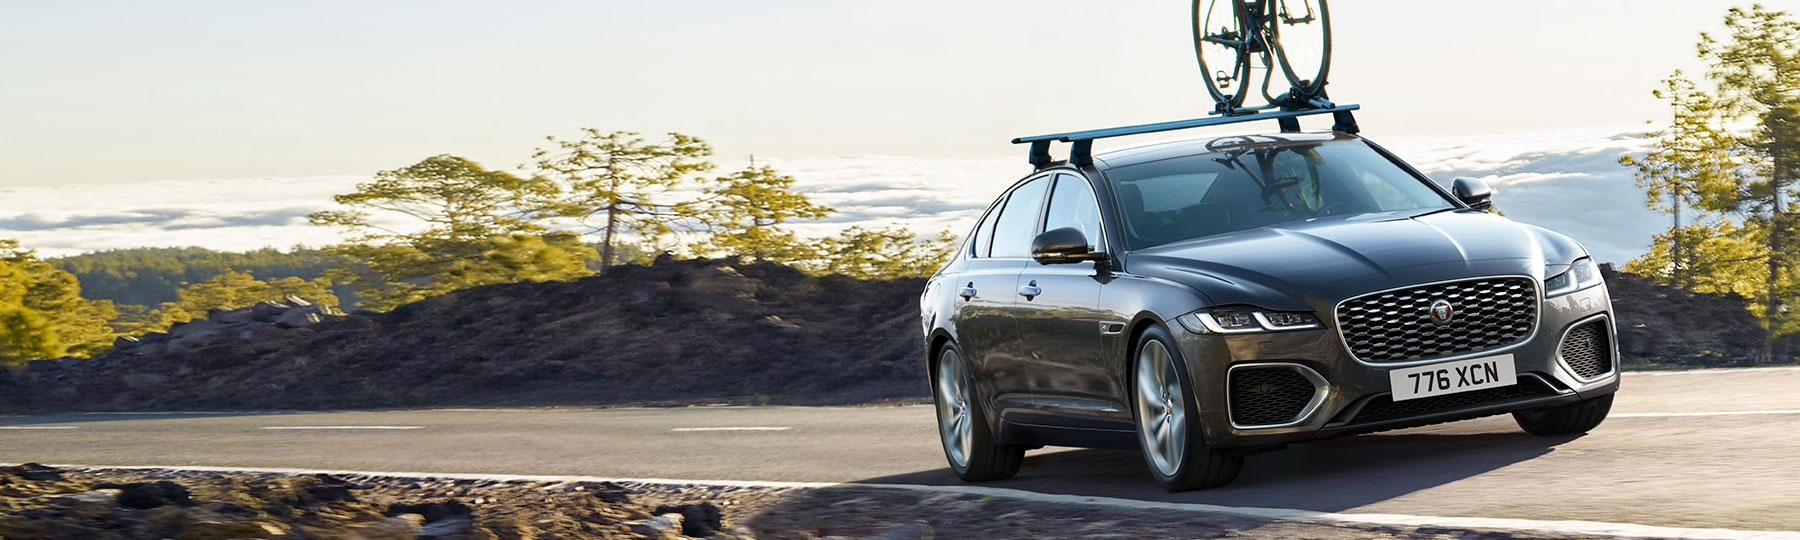 New Jaguar XF Saloon New Car Offer